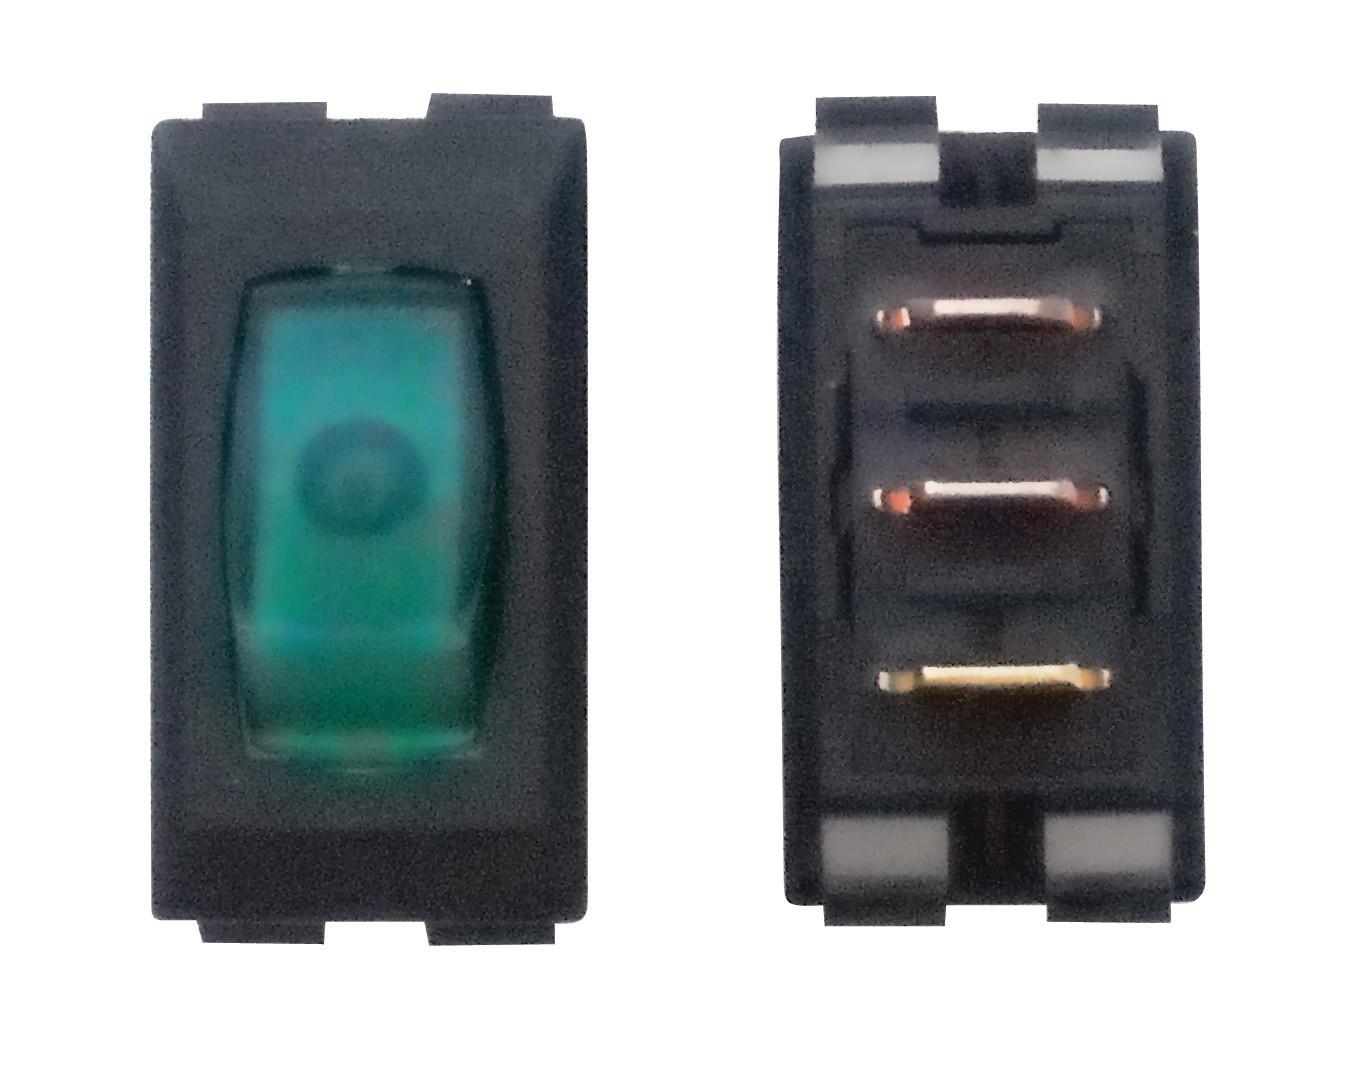 Illuminated On/Off Switch - Green/Black 3/bag